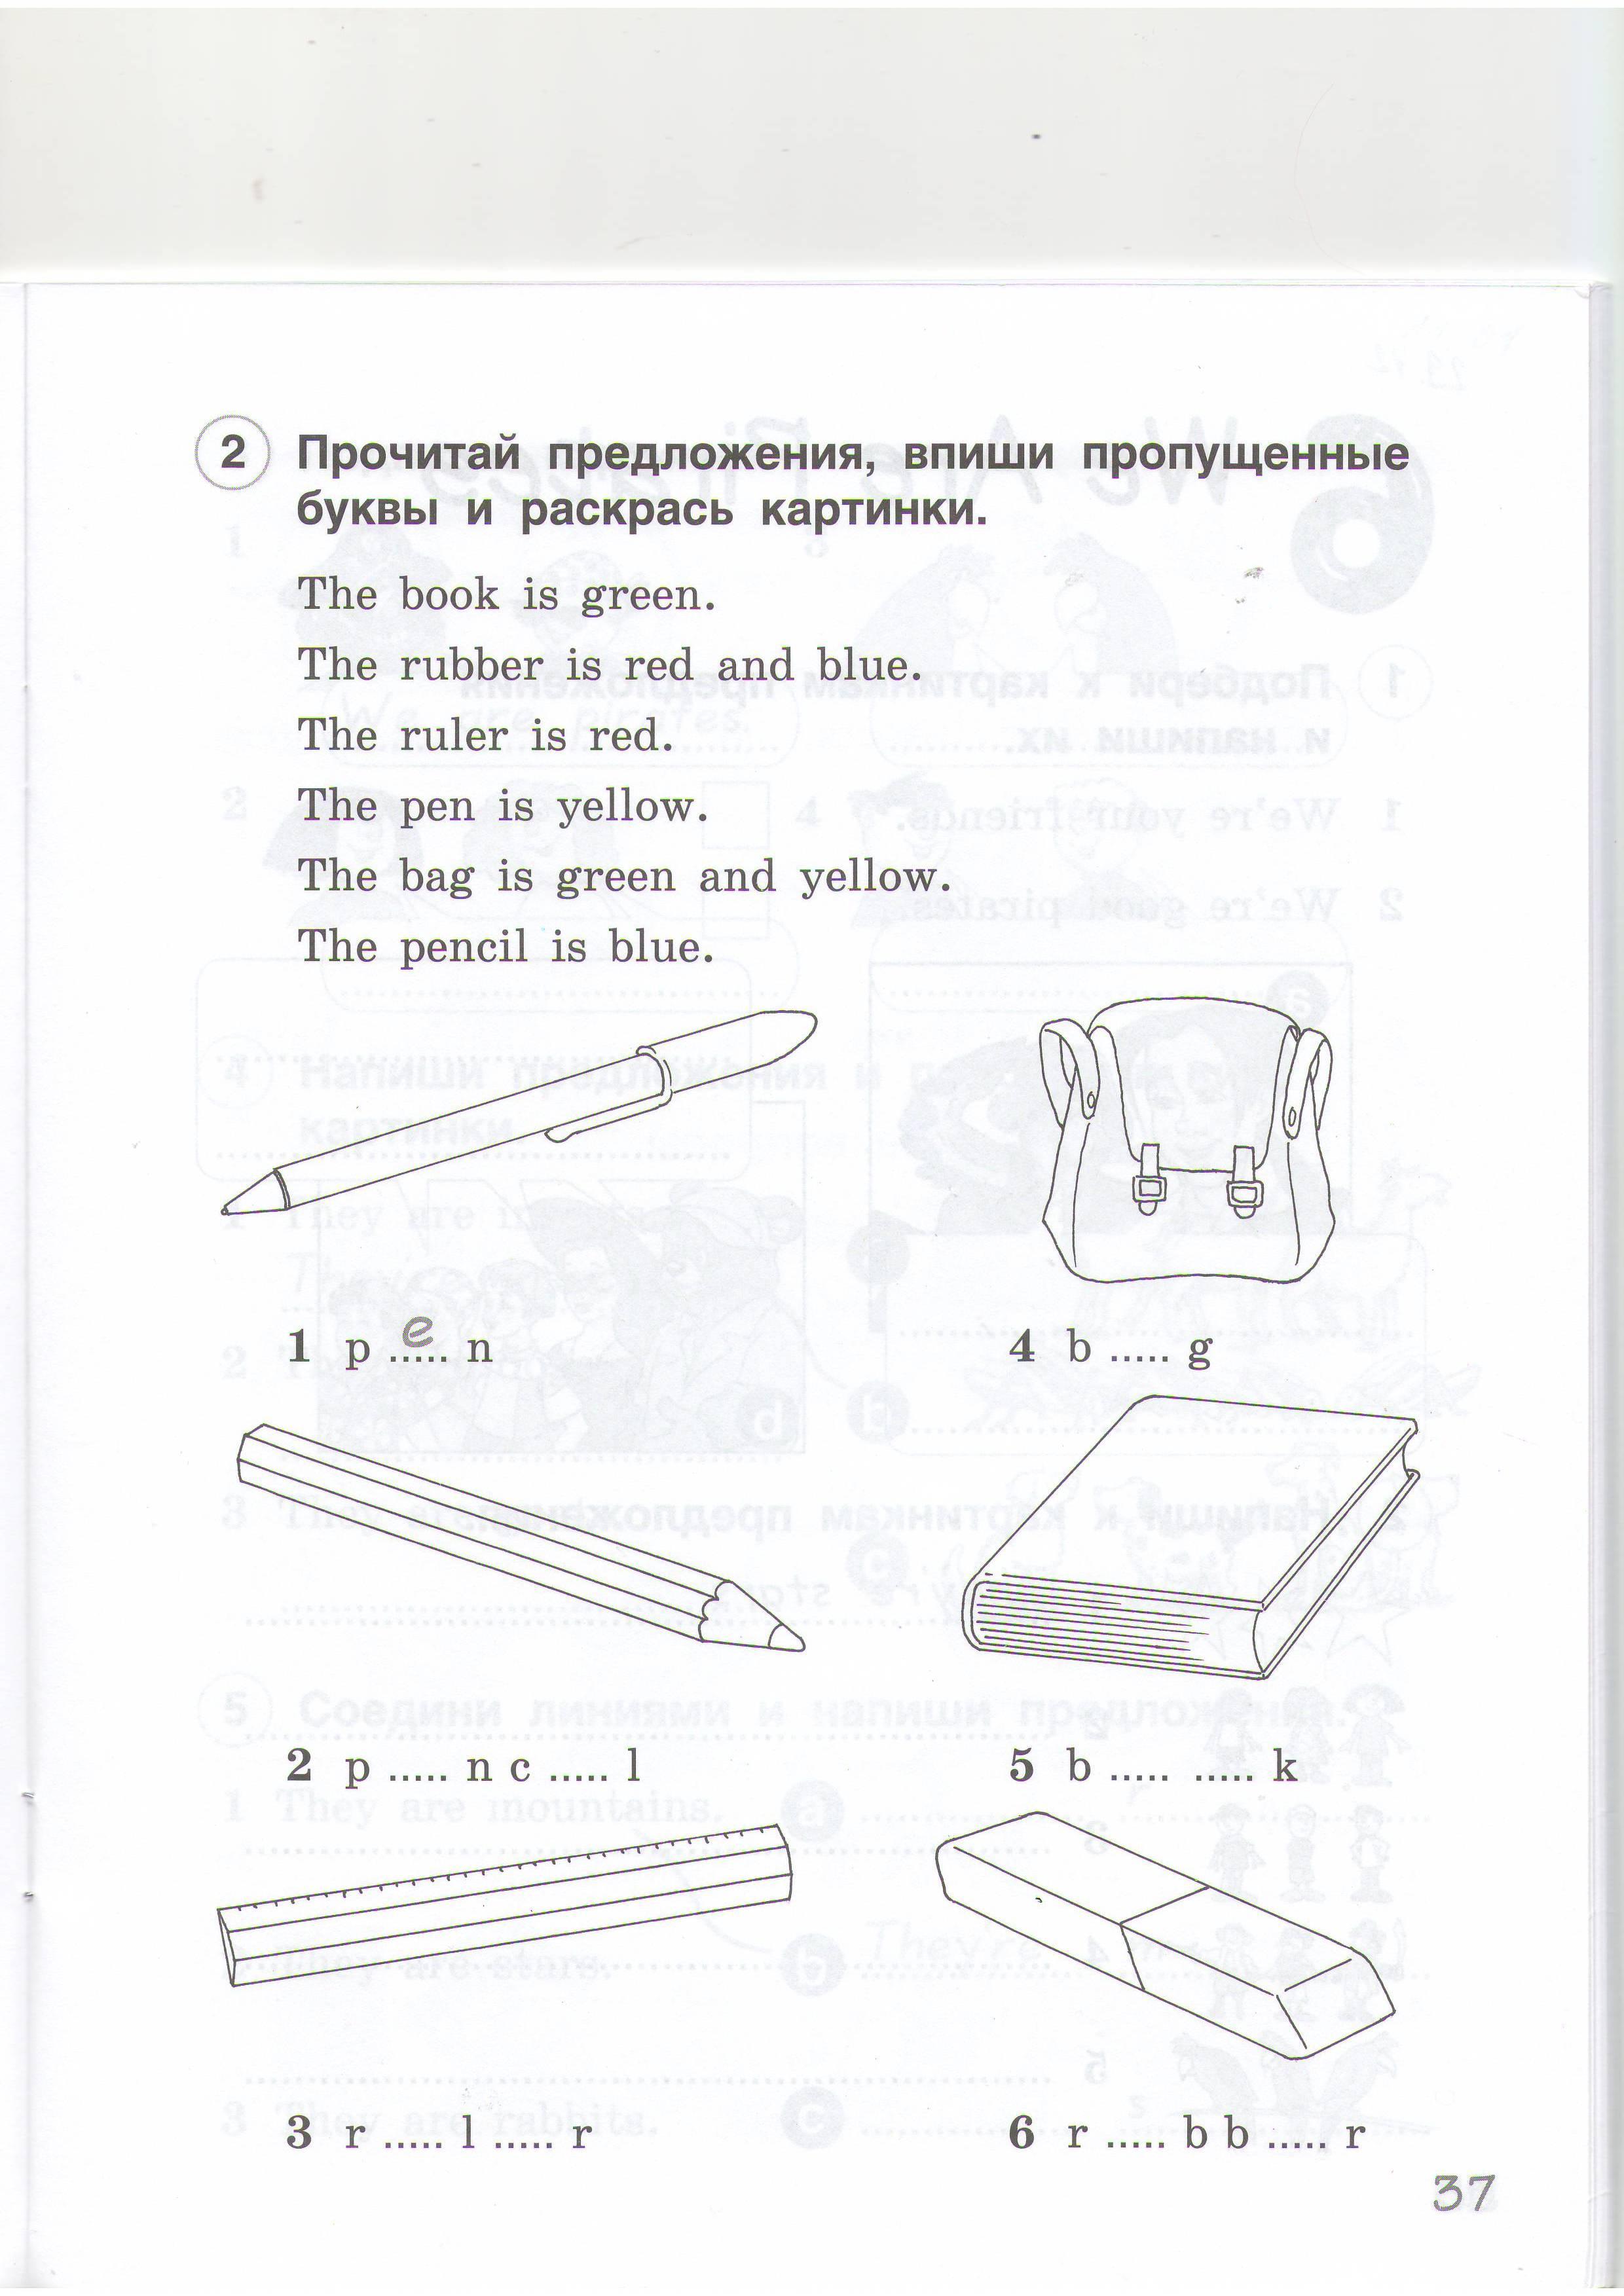 C:\Documents and Settings\ш3\Рабочий стол\2015-10-07\Изображение0003.JPG